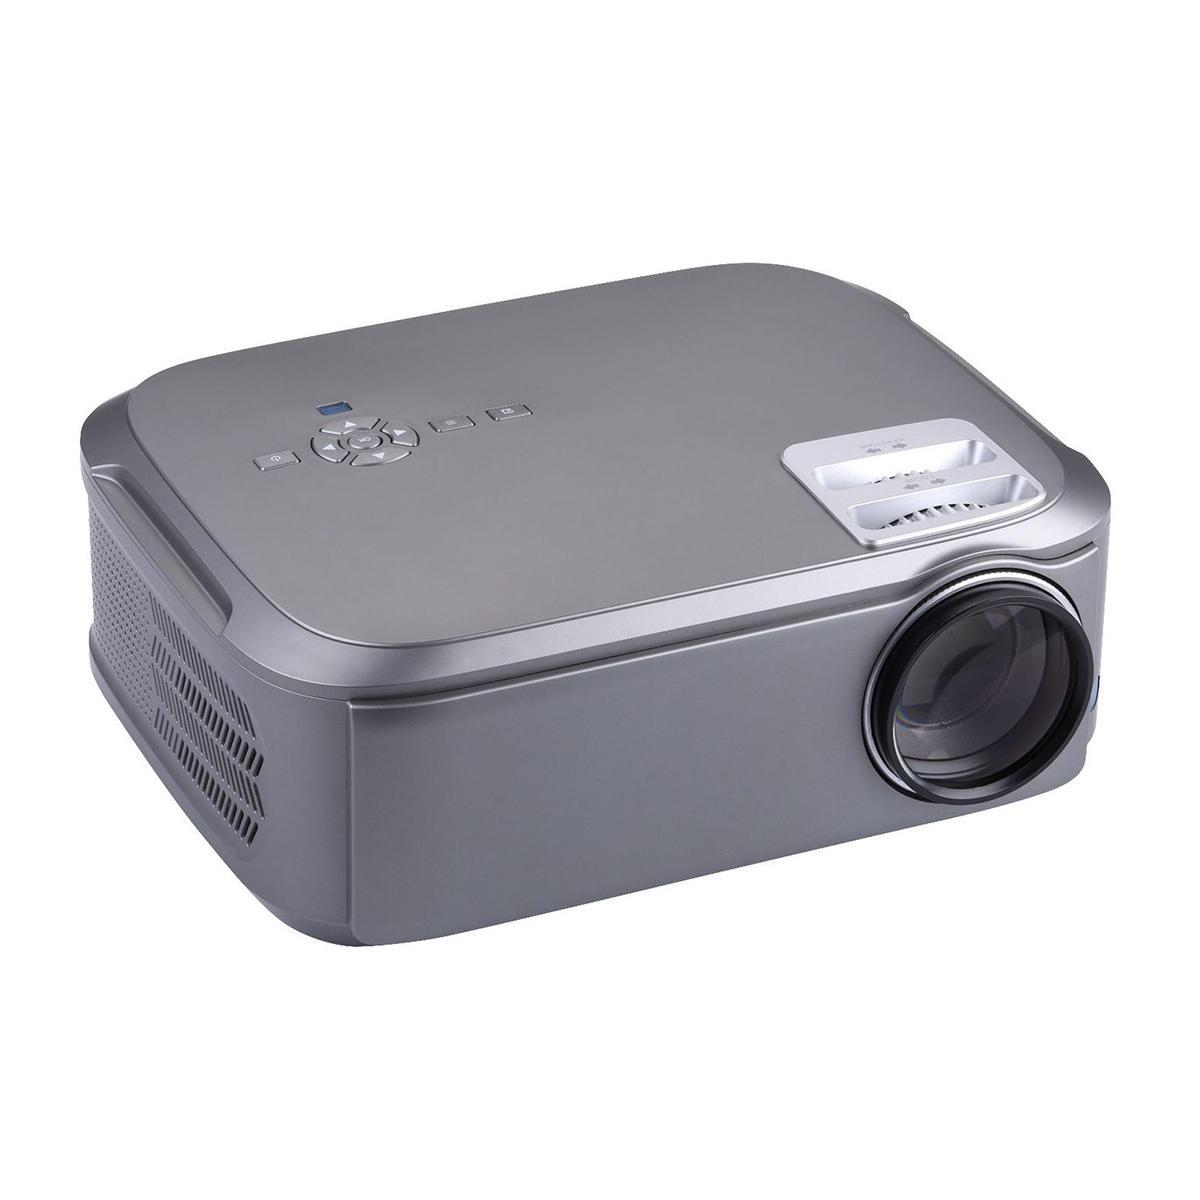 images/new-electronics/A1531420PB/uhappy-u76-mini-lcd-projector-1920-1080dpi-hd-1080p-3500-lumens-led-projector-mini-home-theater-hdmi-usb-av-vga-plusbuyer.jpg